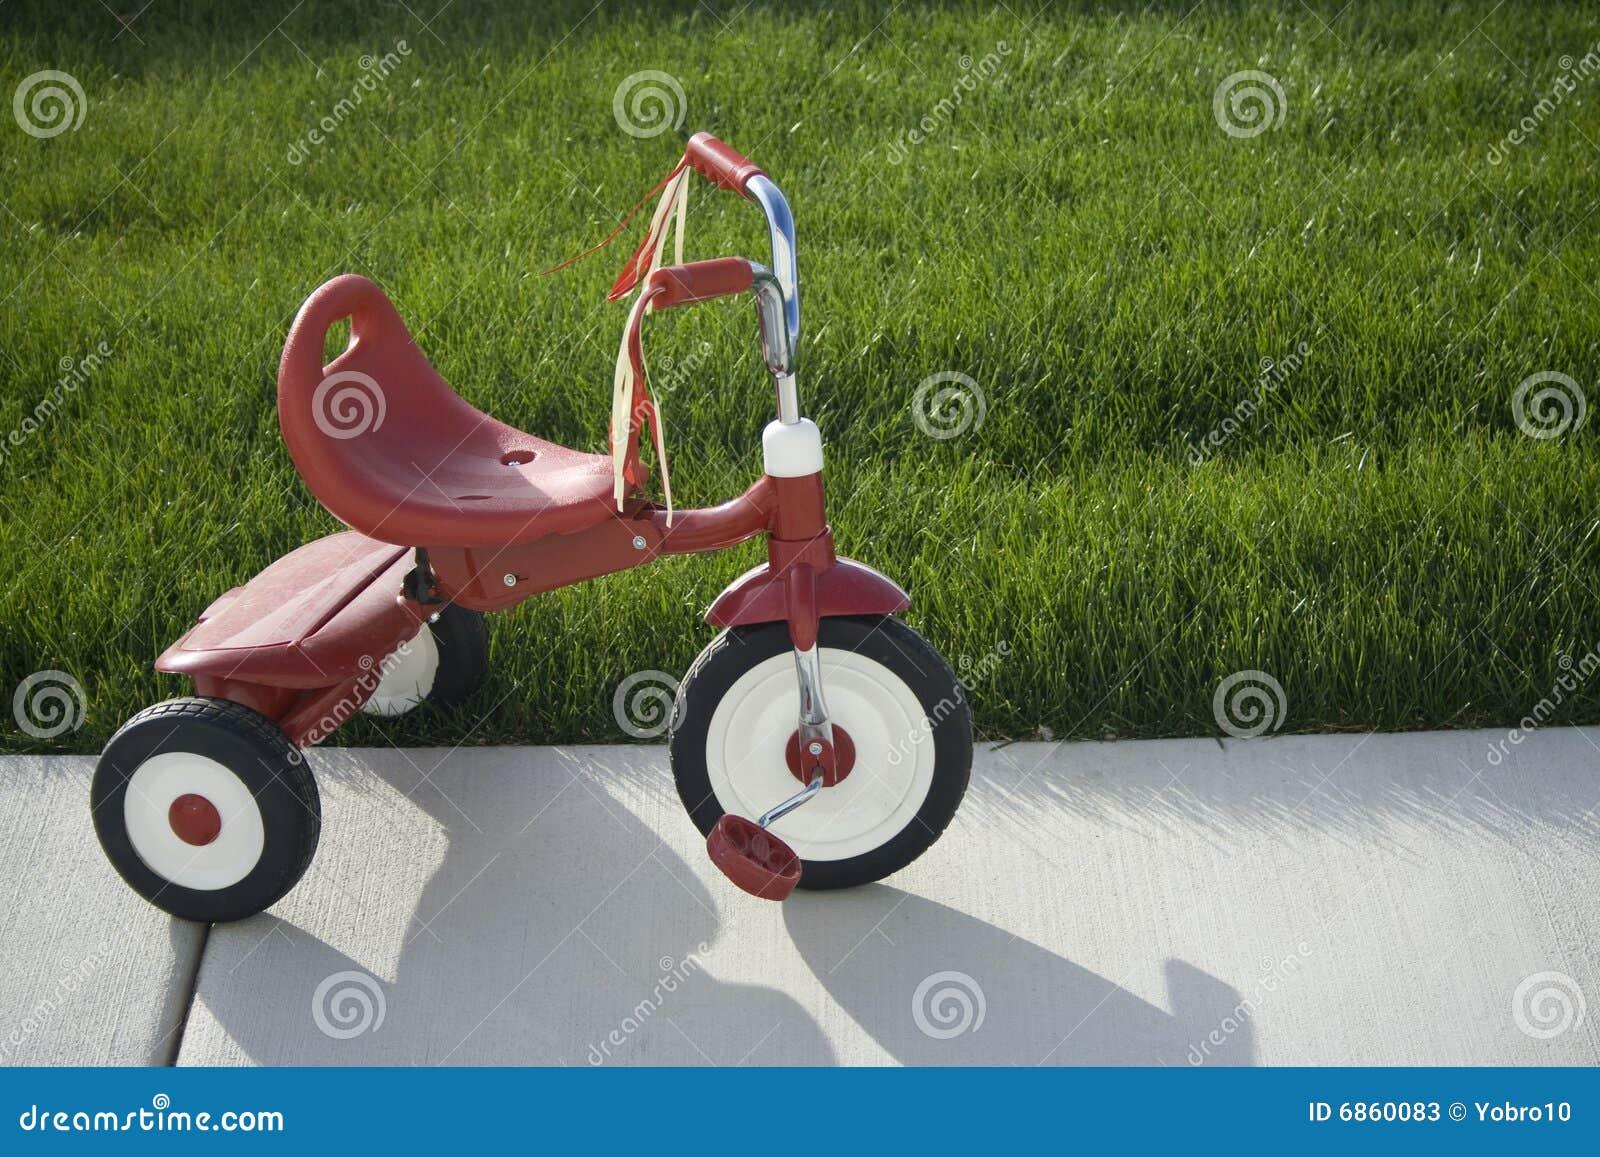 ягнит трицикл